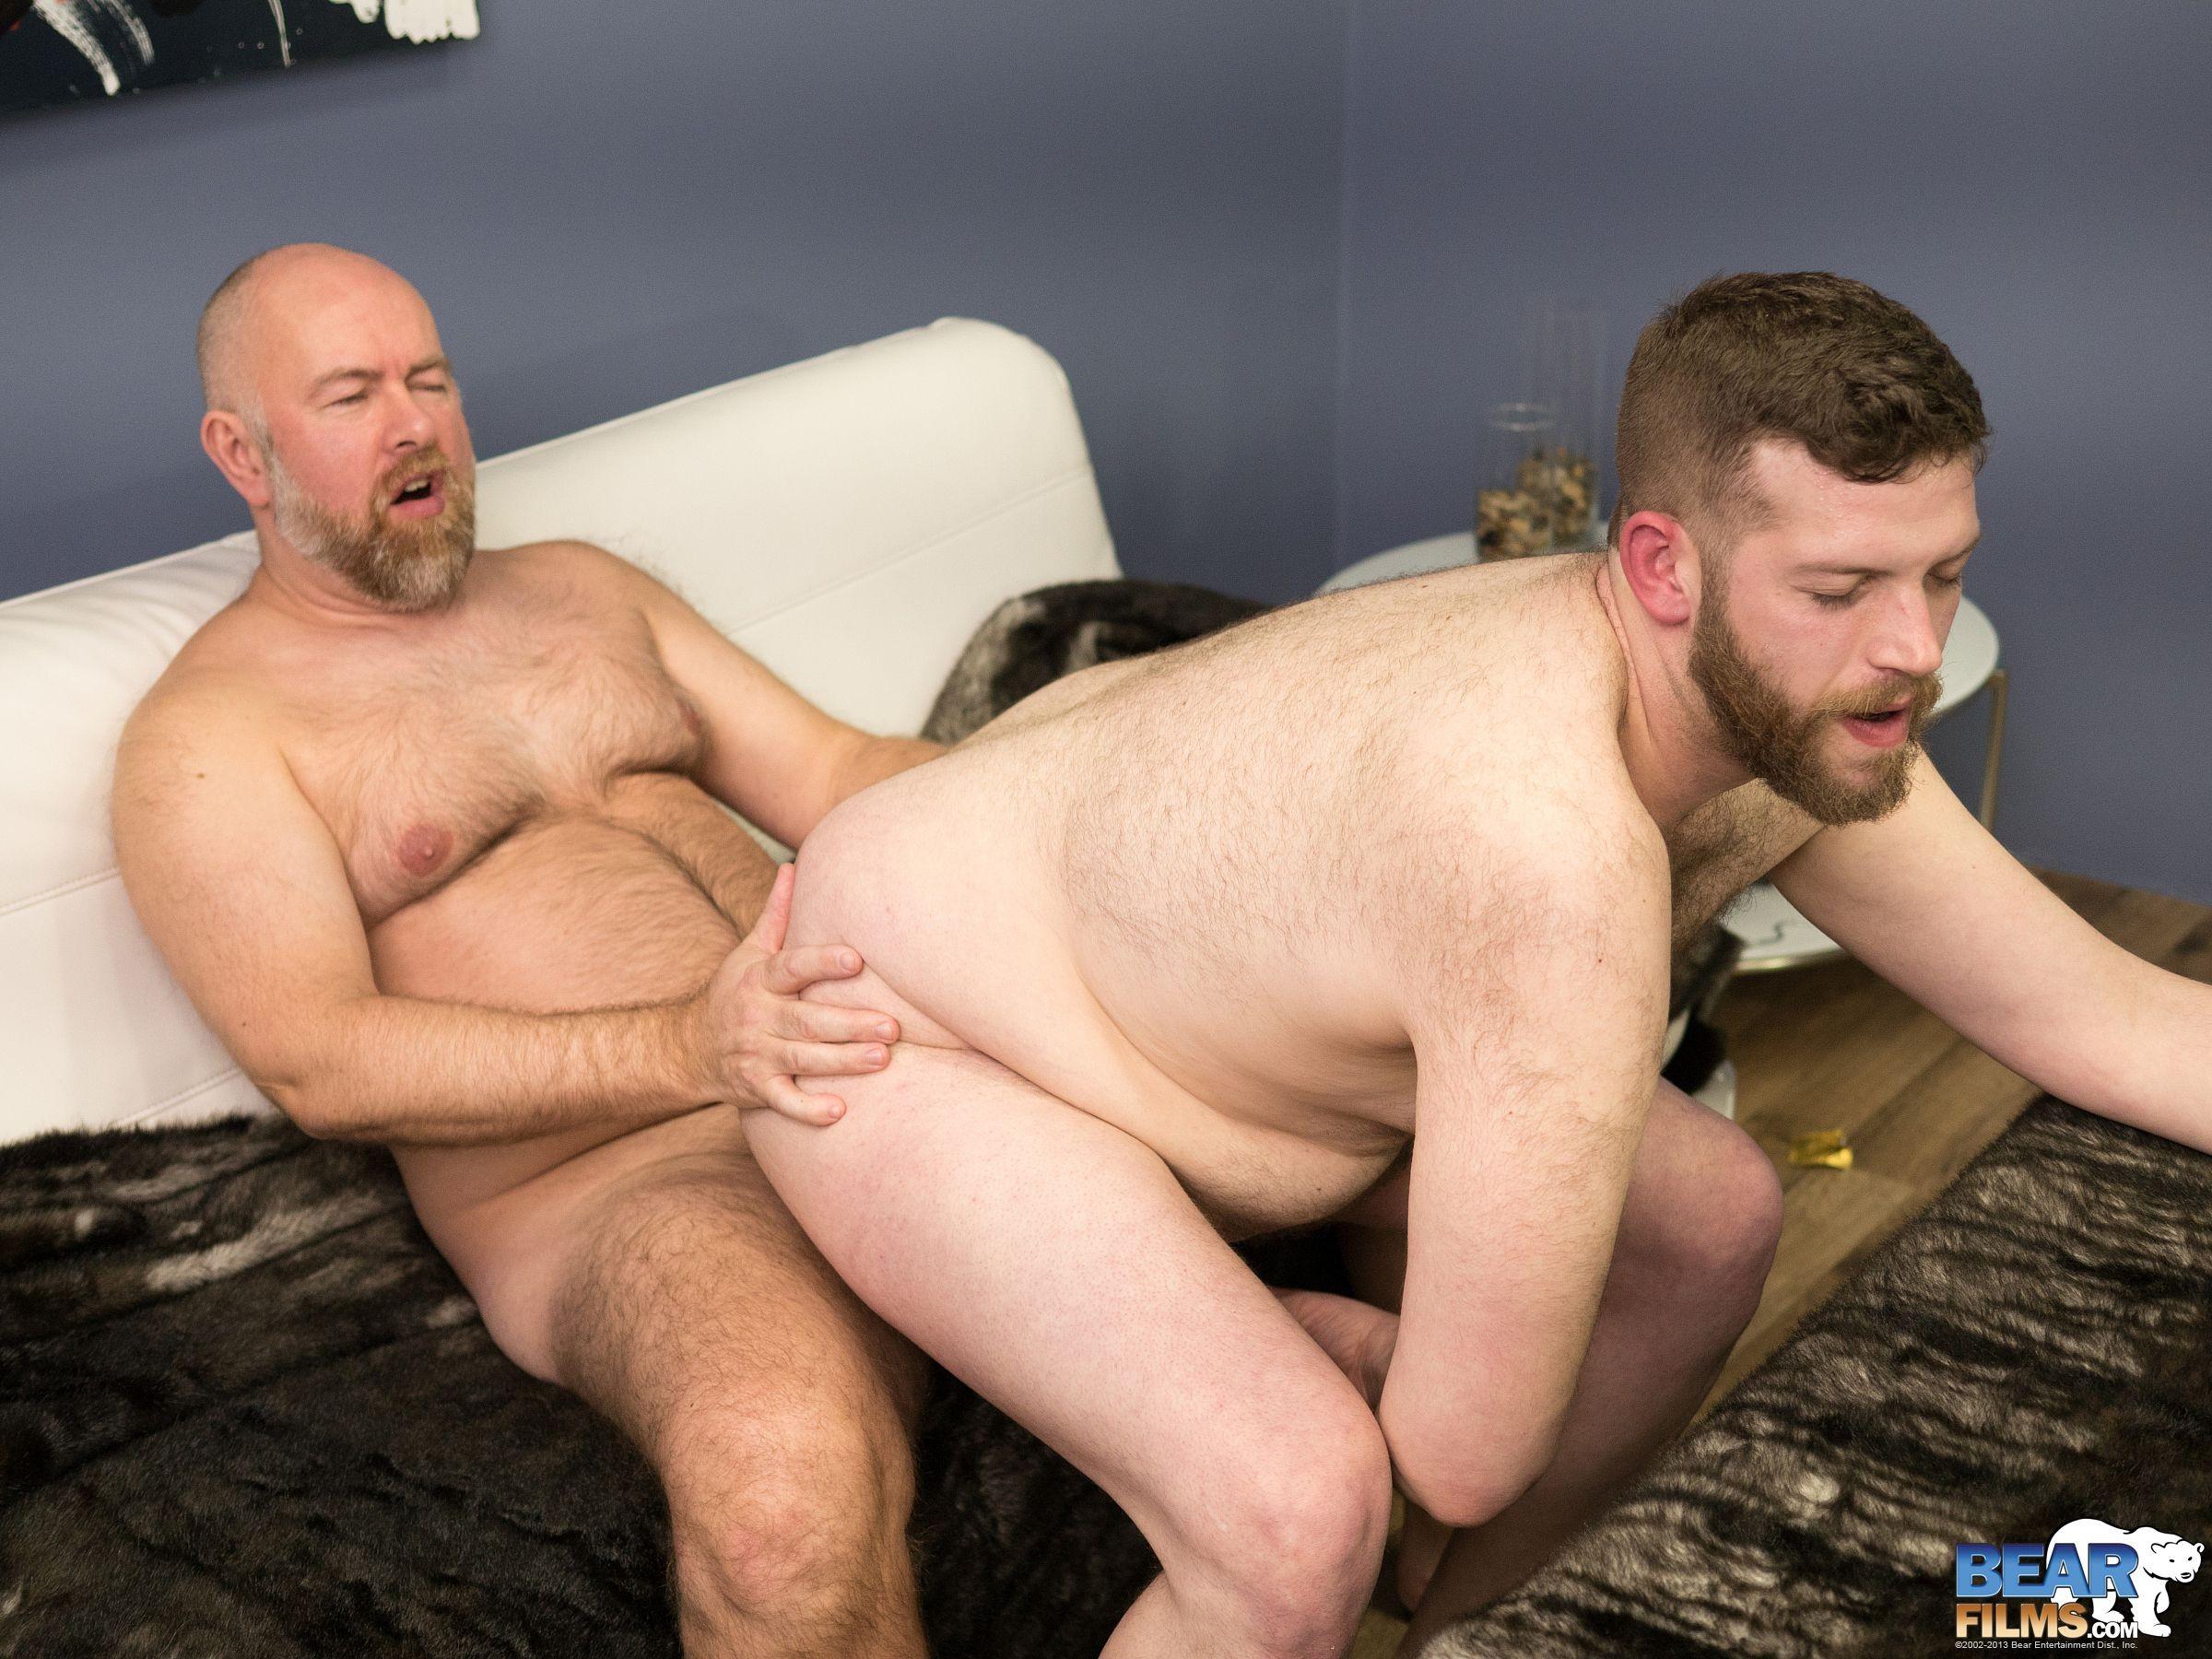 Bear Porn scoot matthews n guy english from bear films at justusboys